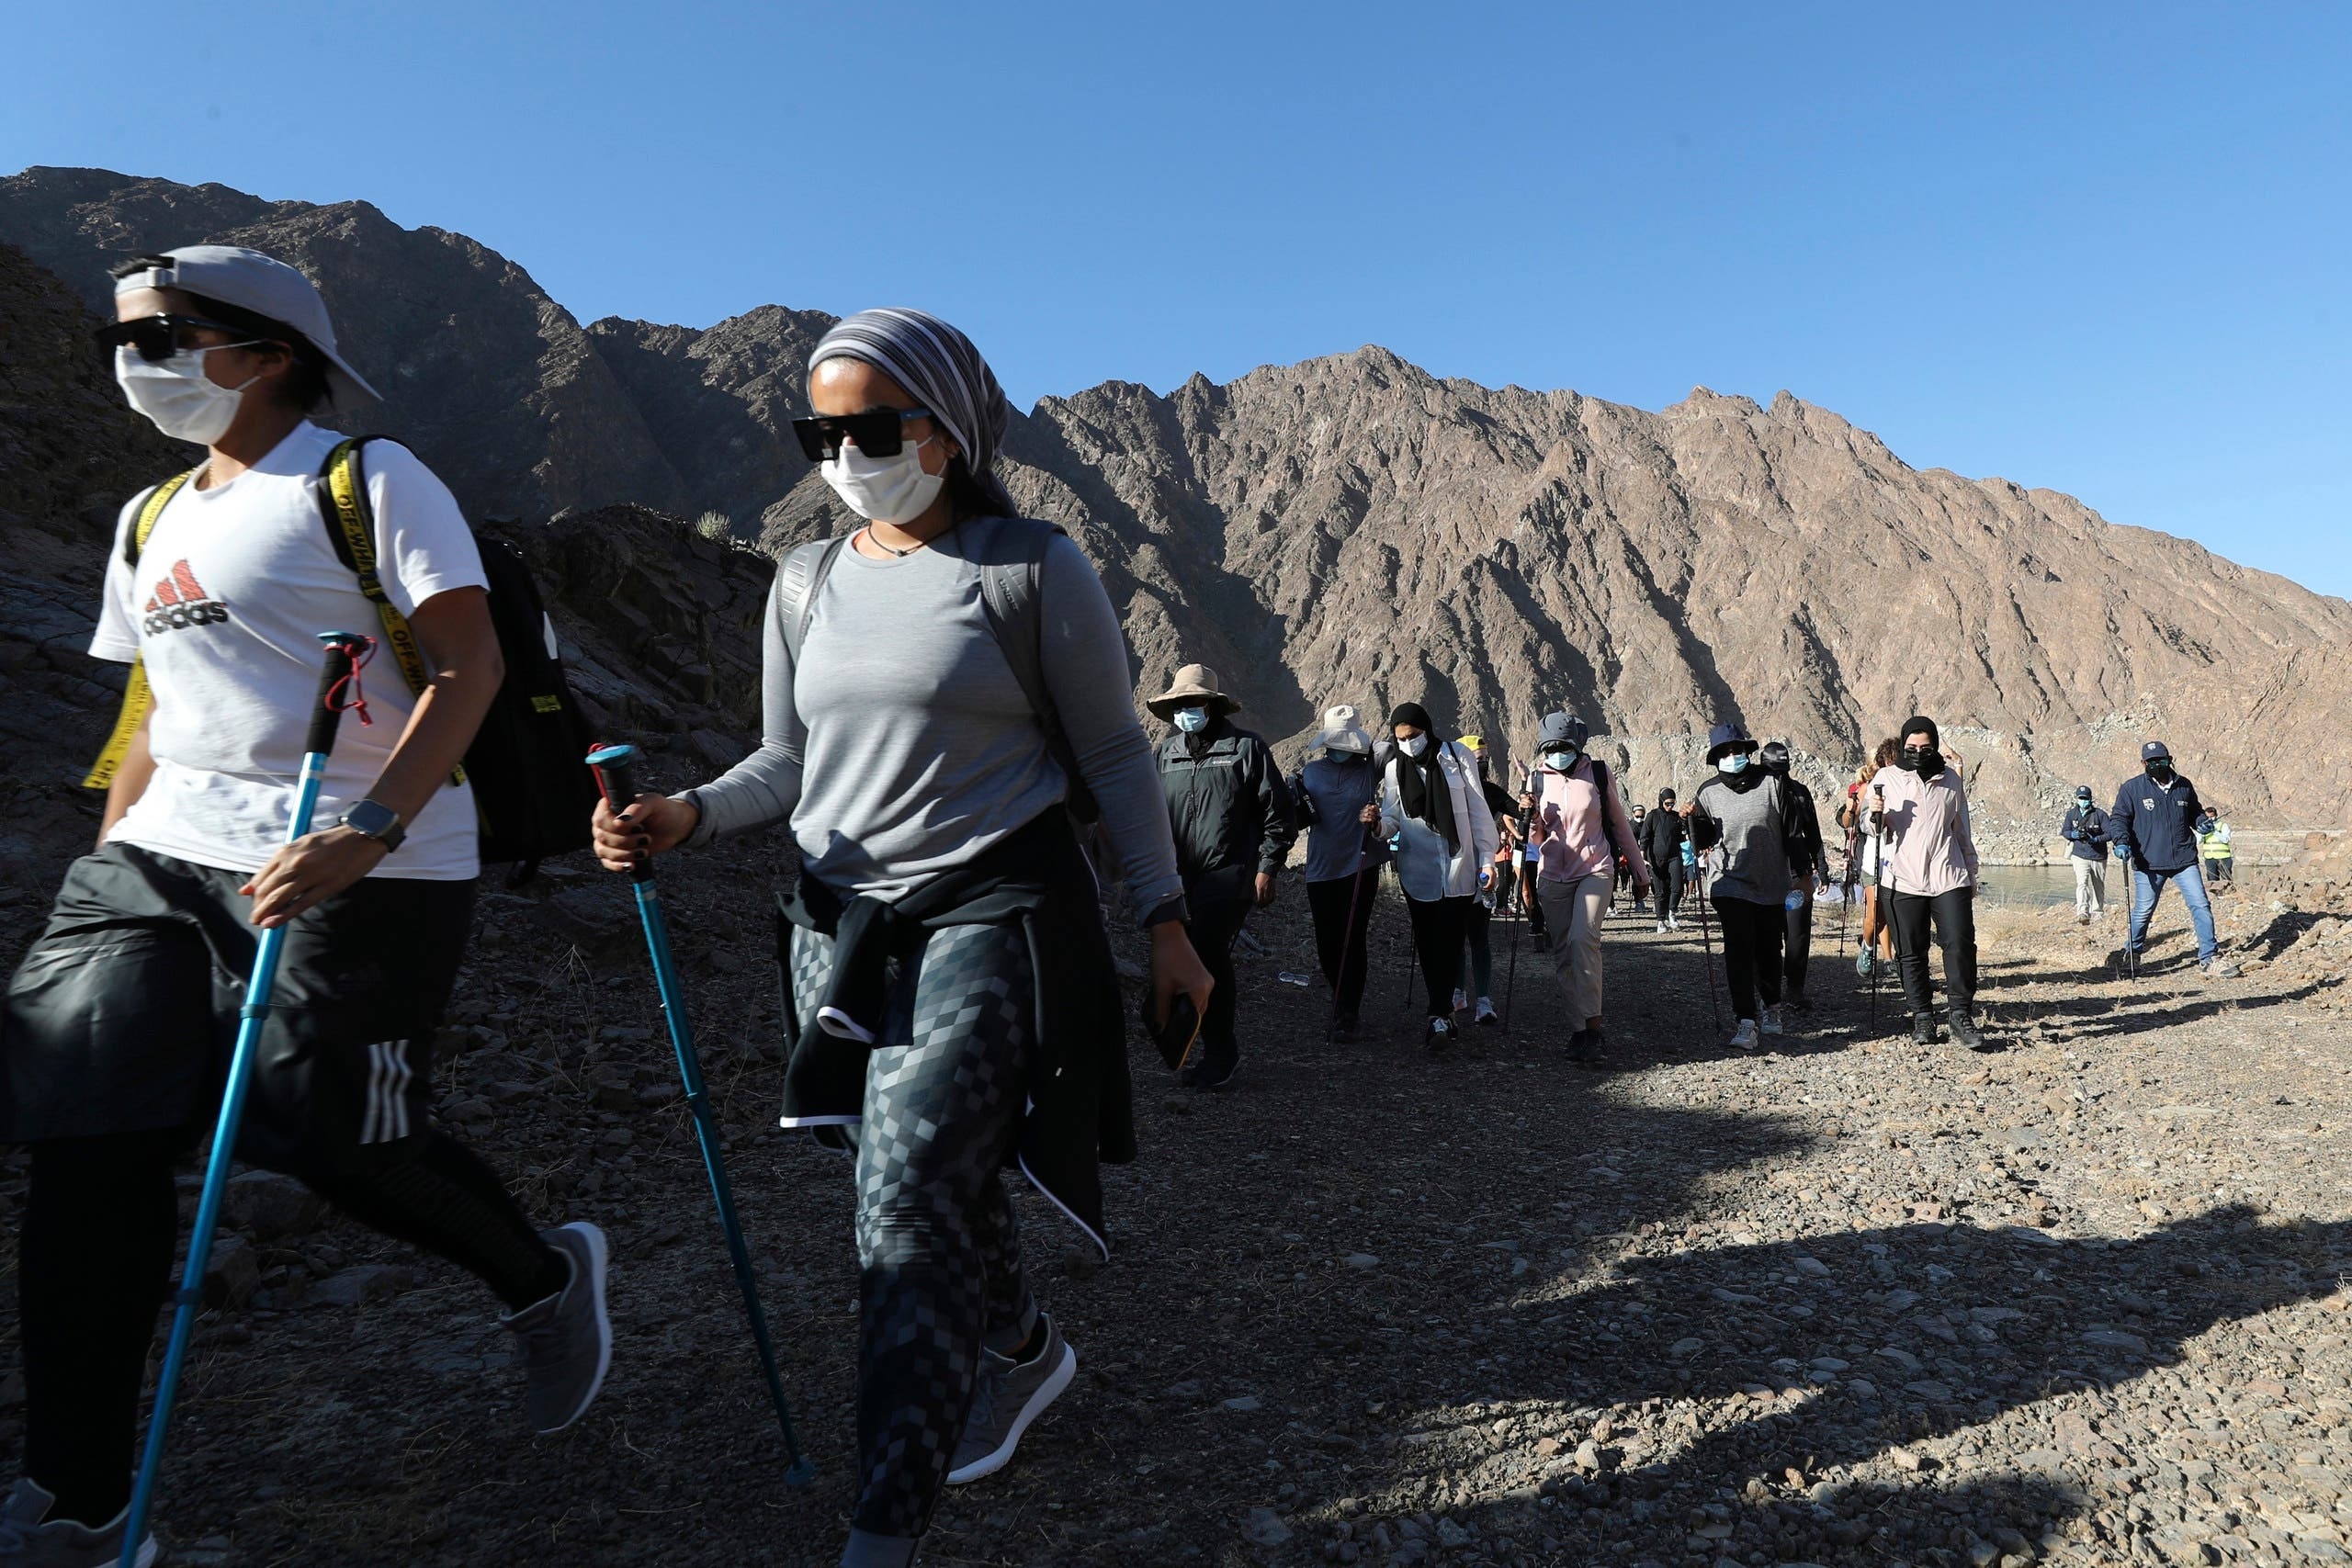 Participants walk during the Women's Adventure Hatta organized by Dubai Sports Council in Hatta, United Arab Emirates on Oct. 23, 2020. (AP)